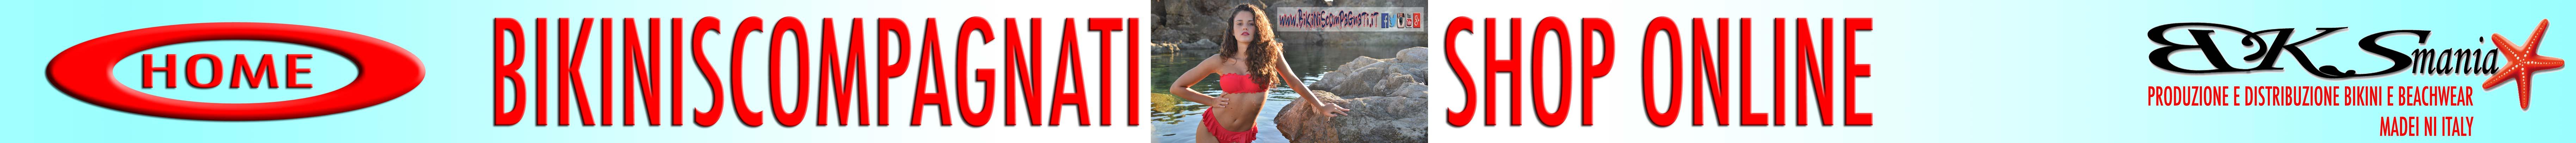 Bikiniscompagnati shop online